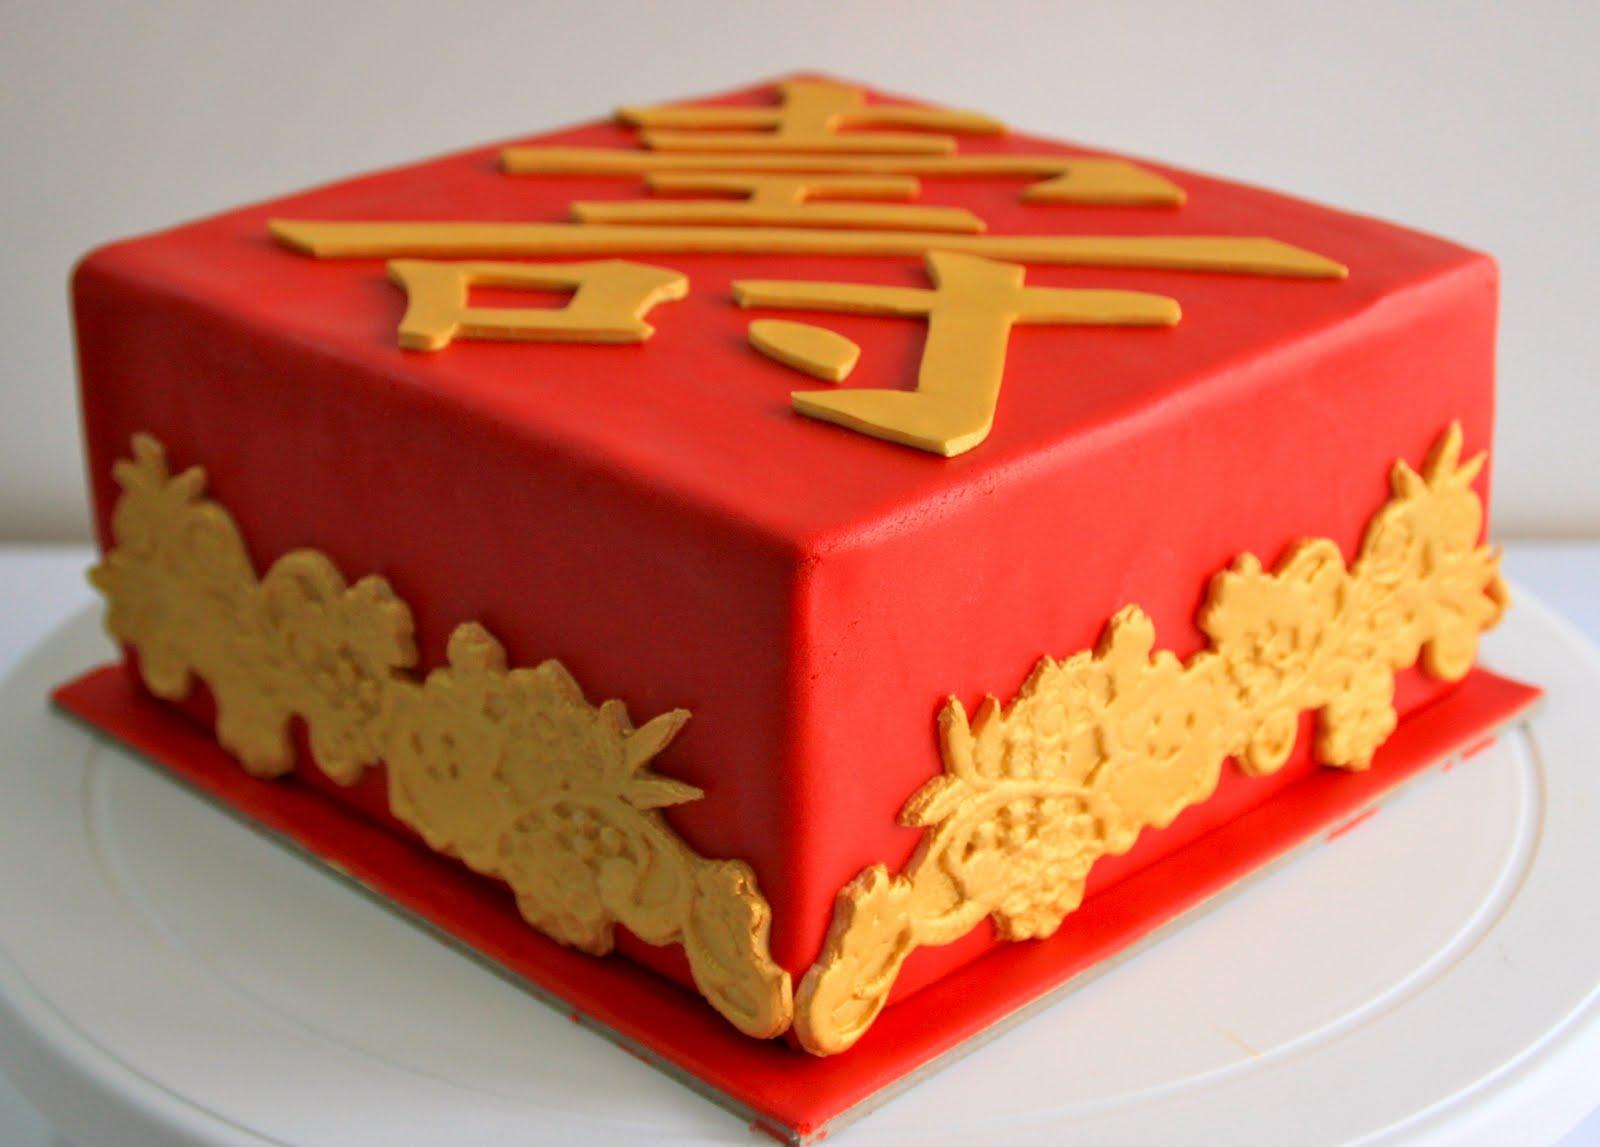 壽 Longevity Cake